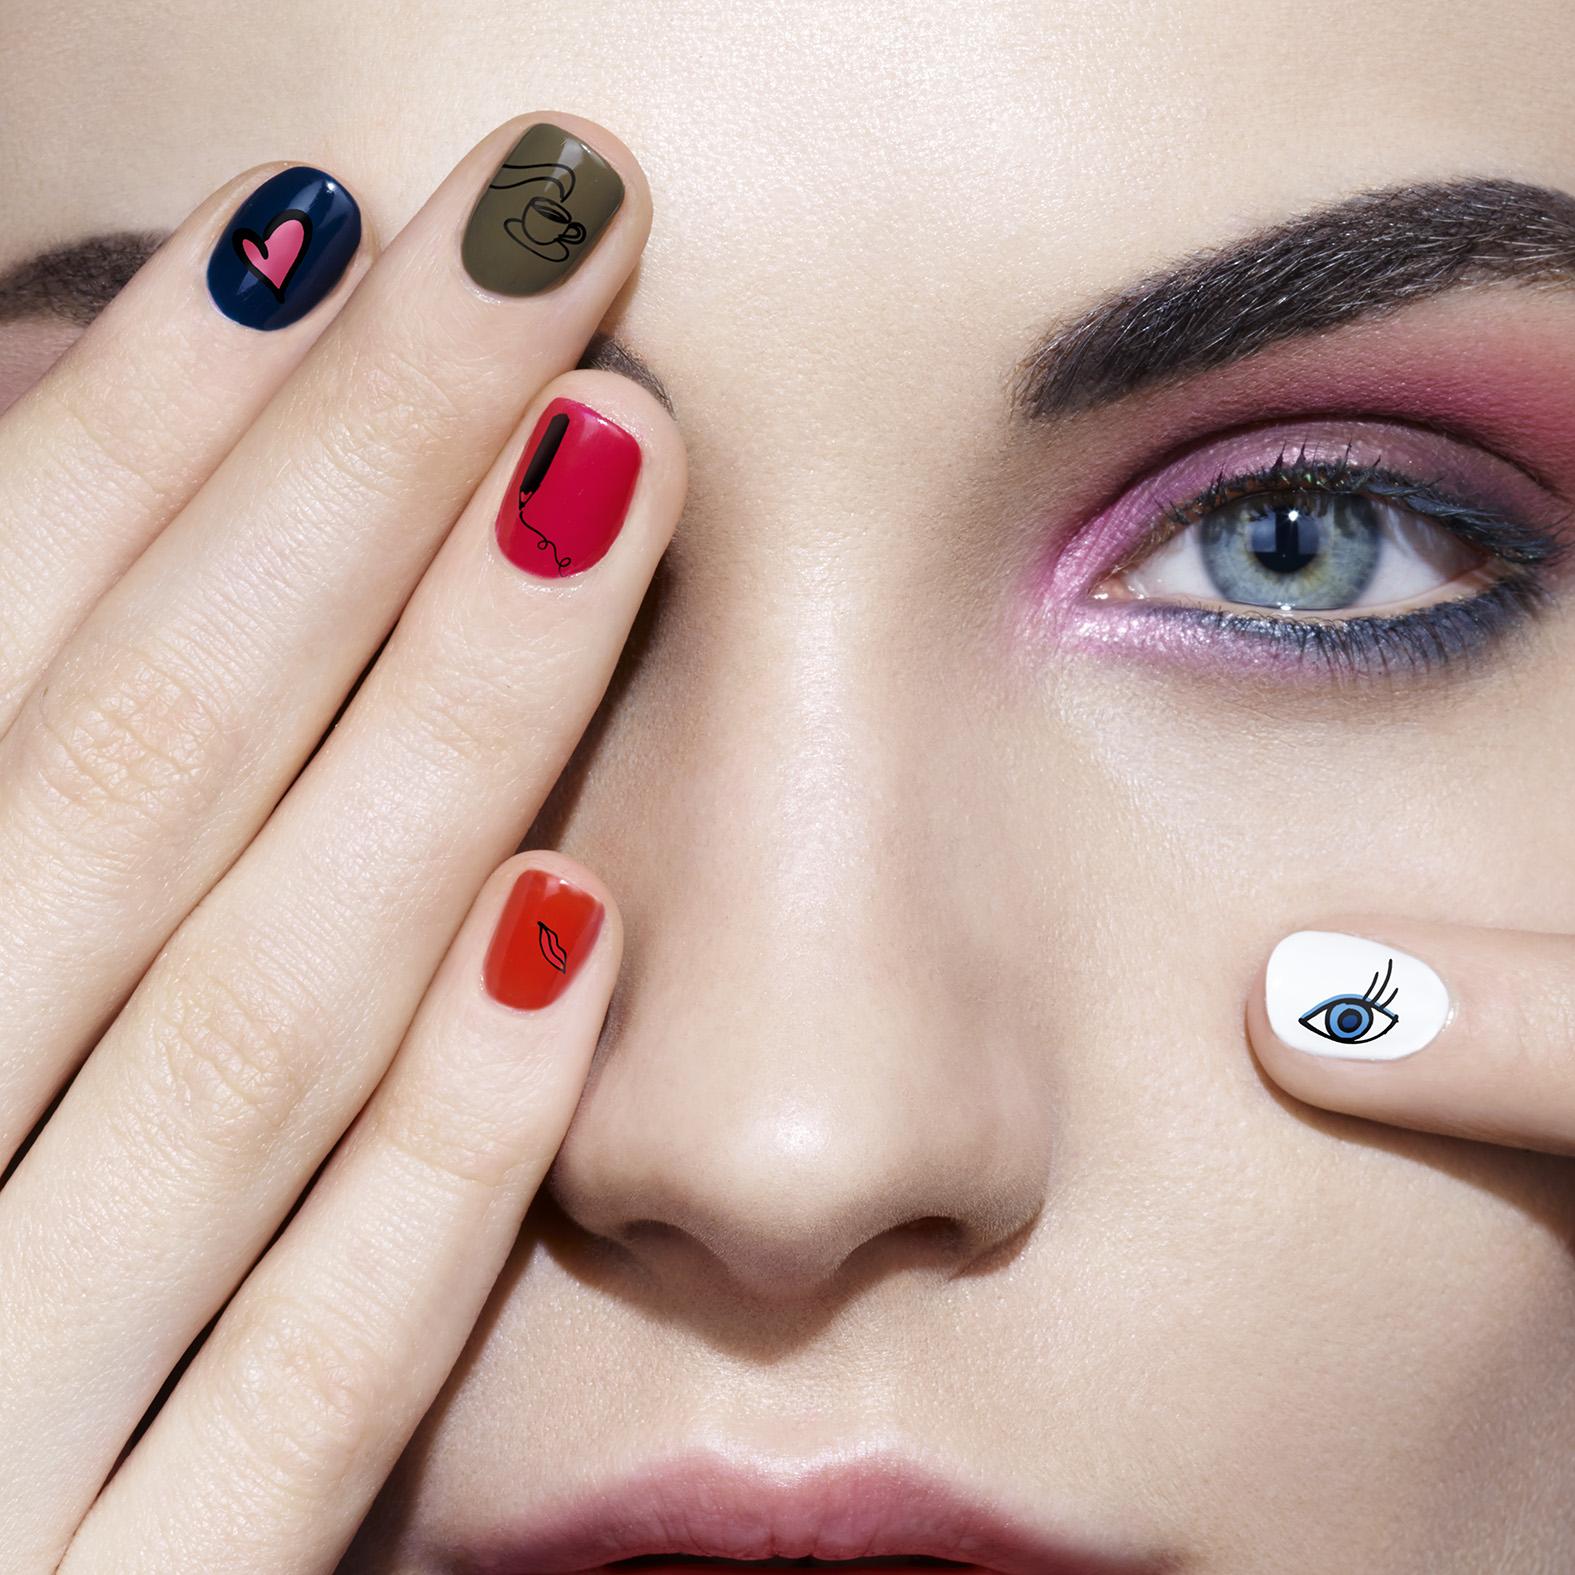 Sonia rykiel fall makeup collection